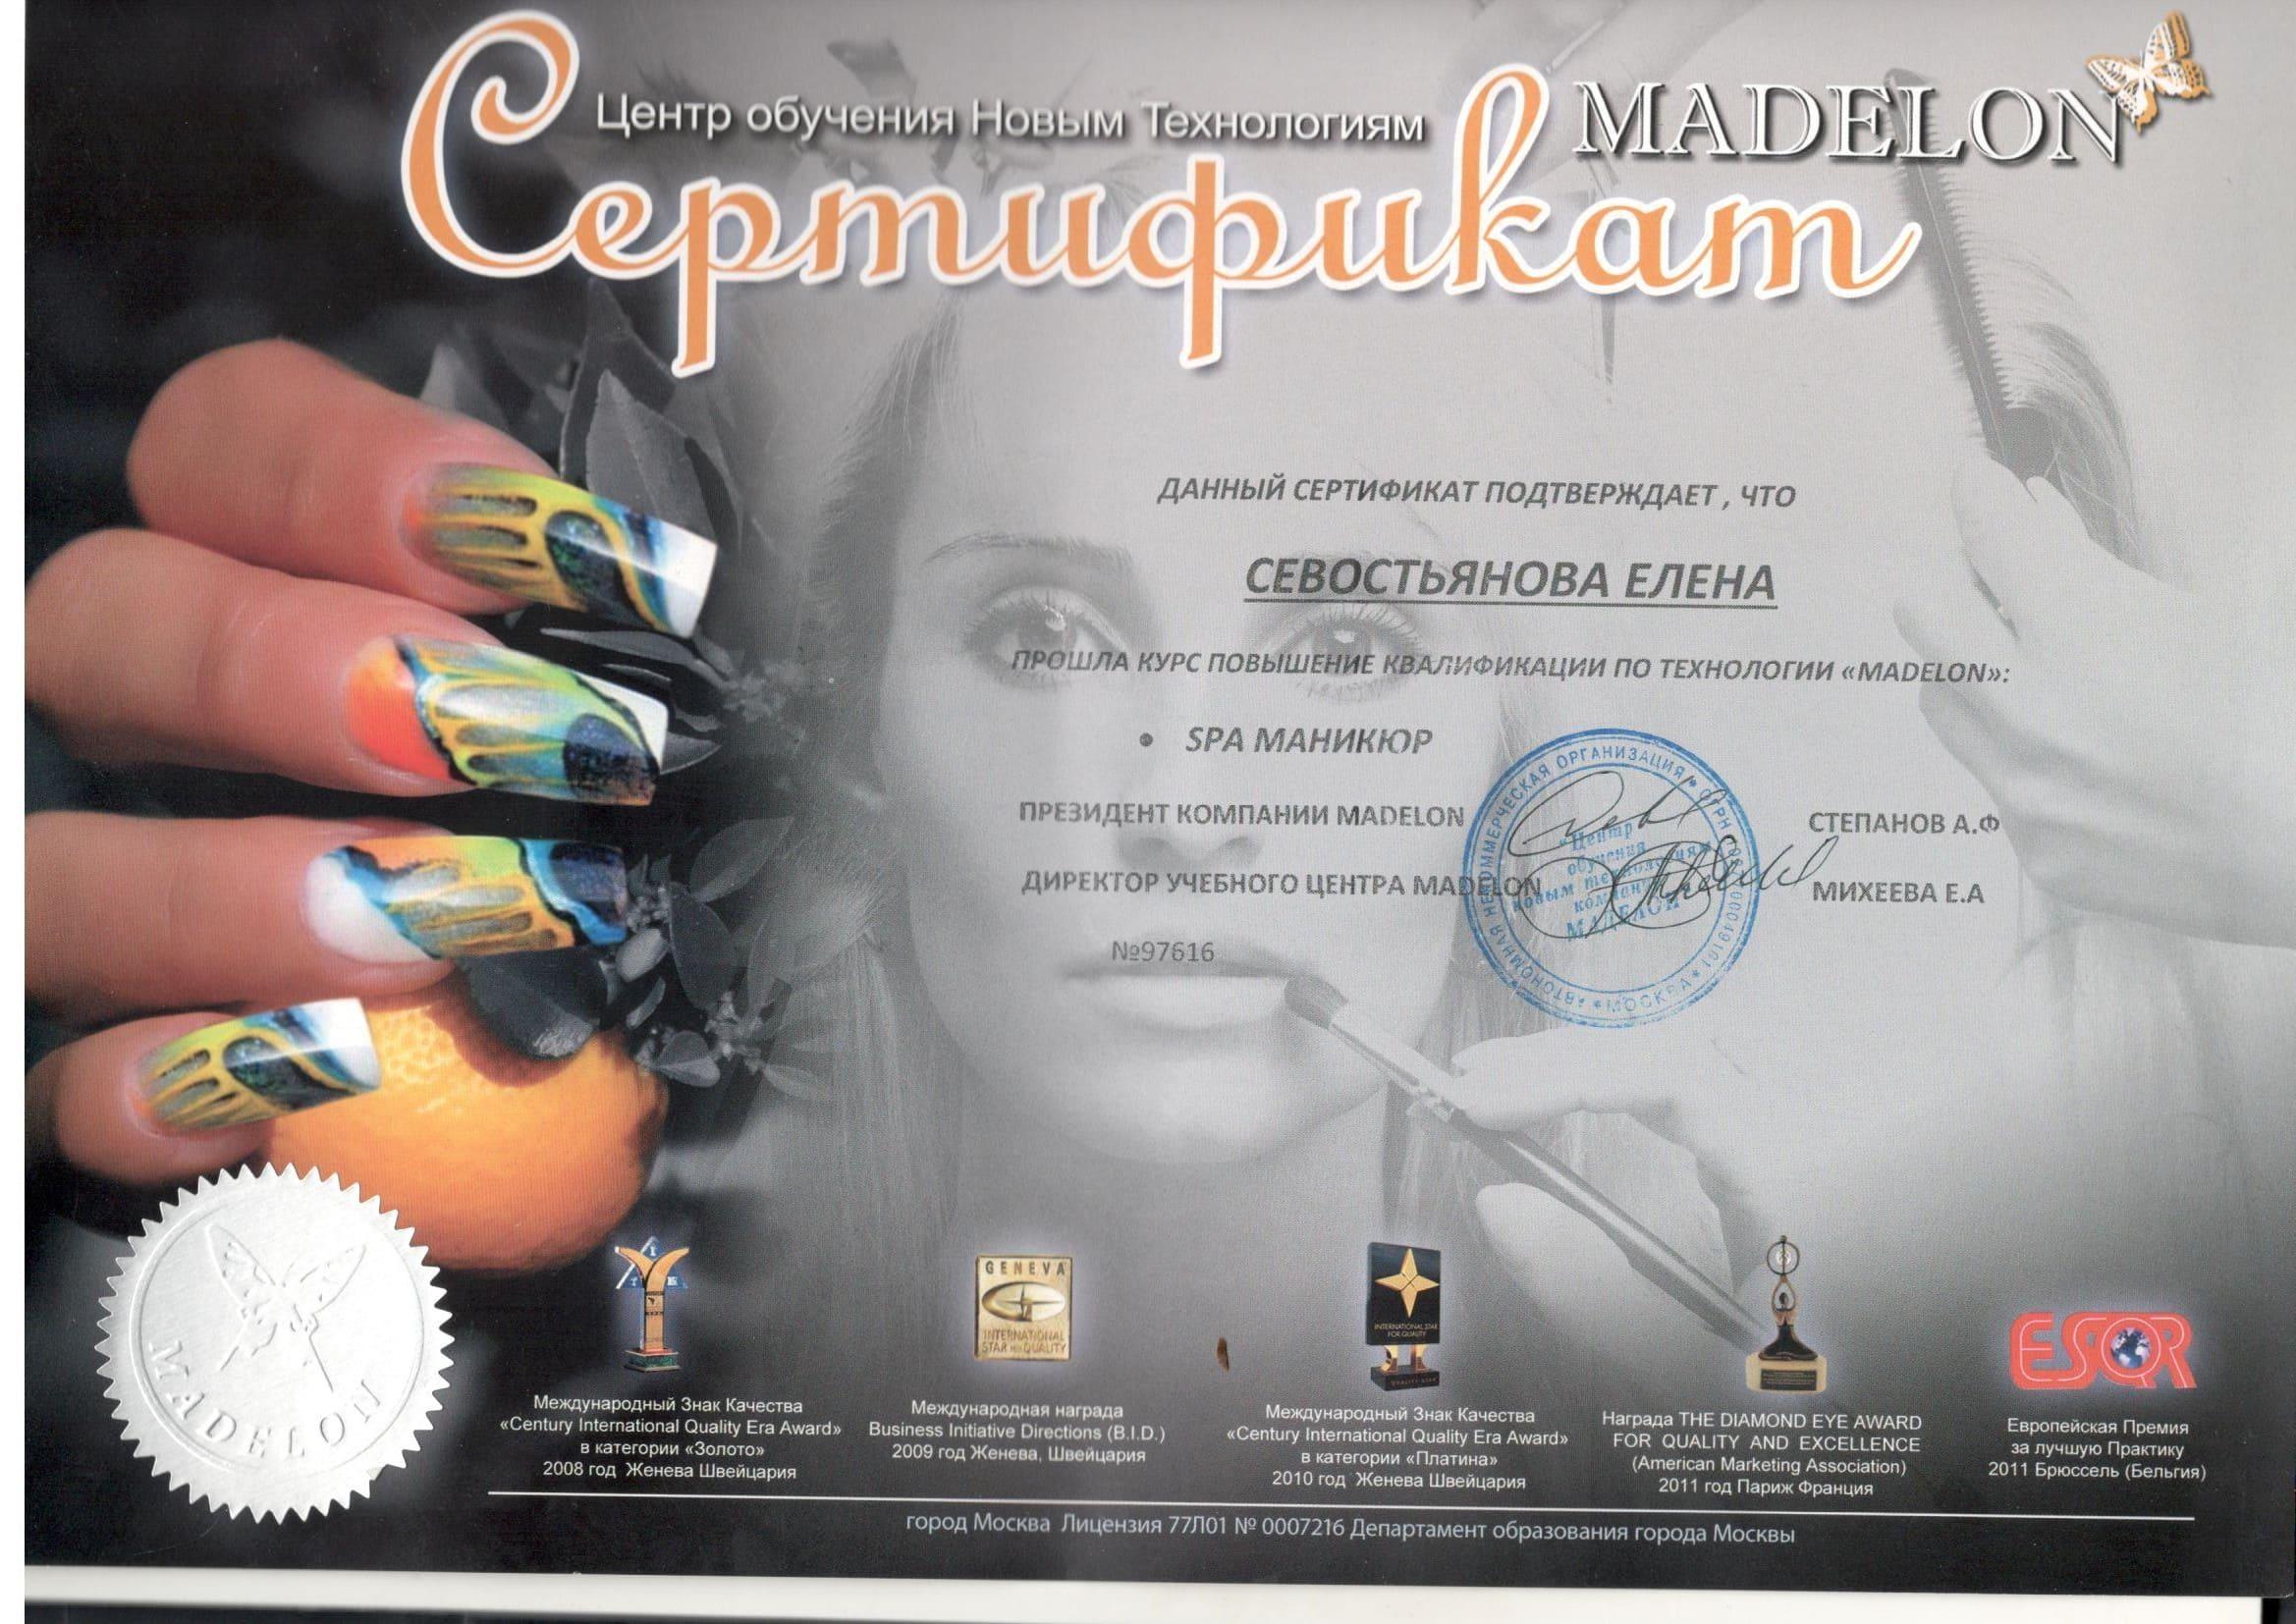 Спа маникюр Madelon